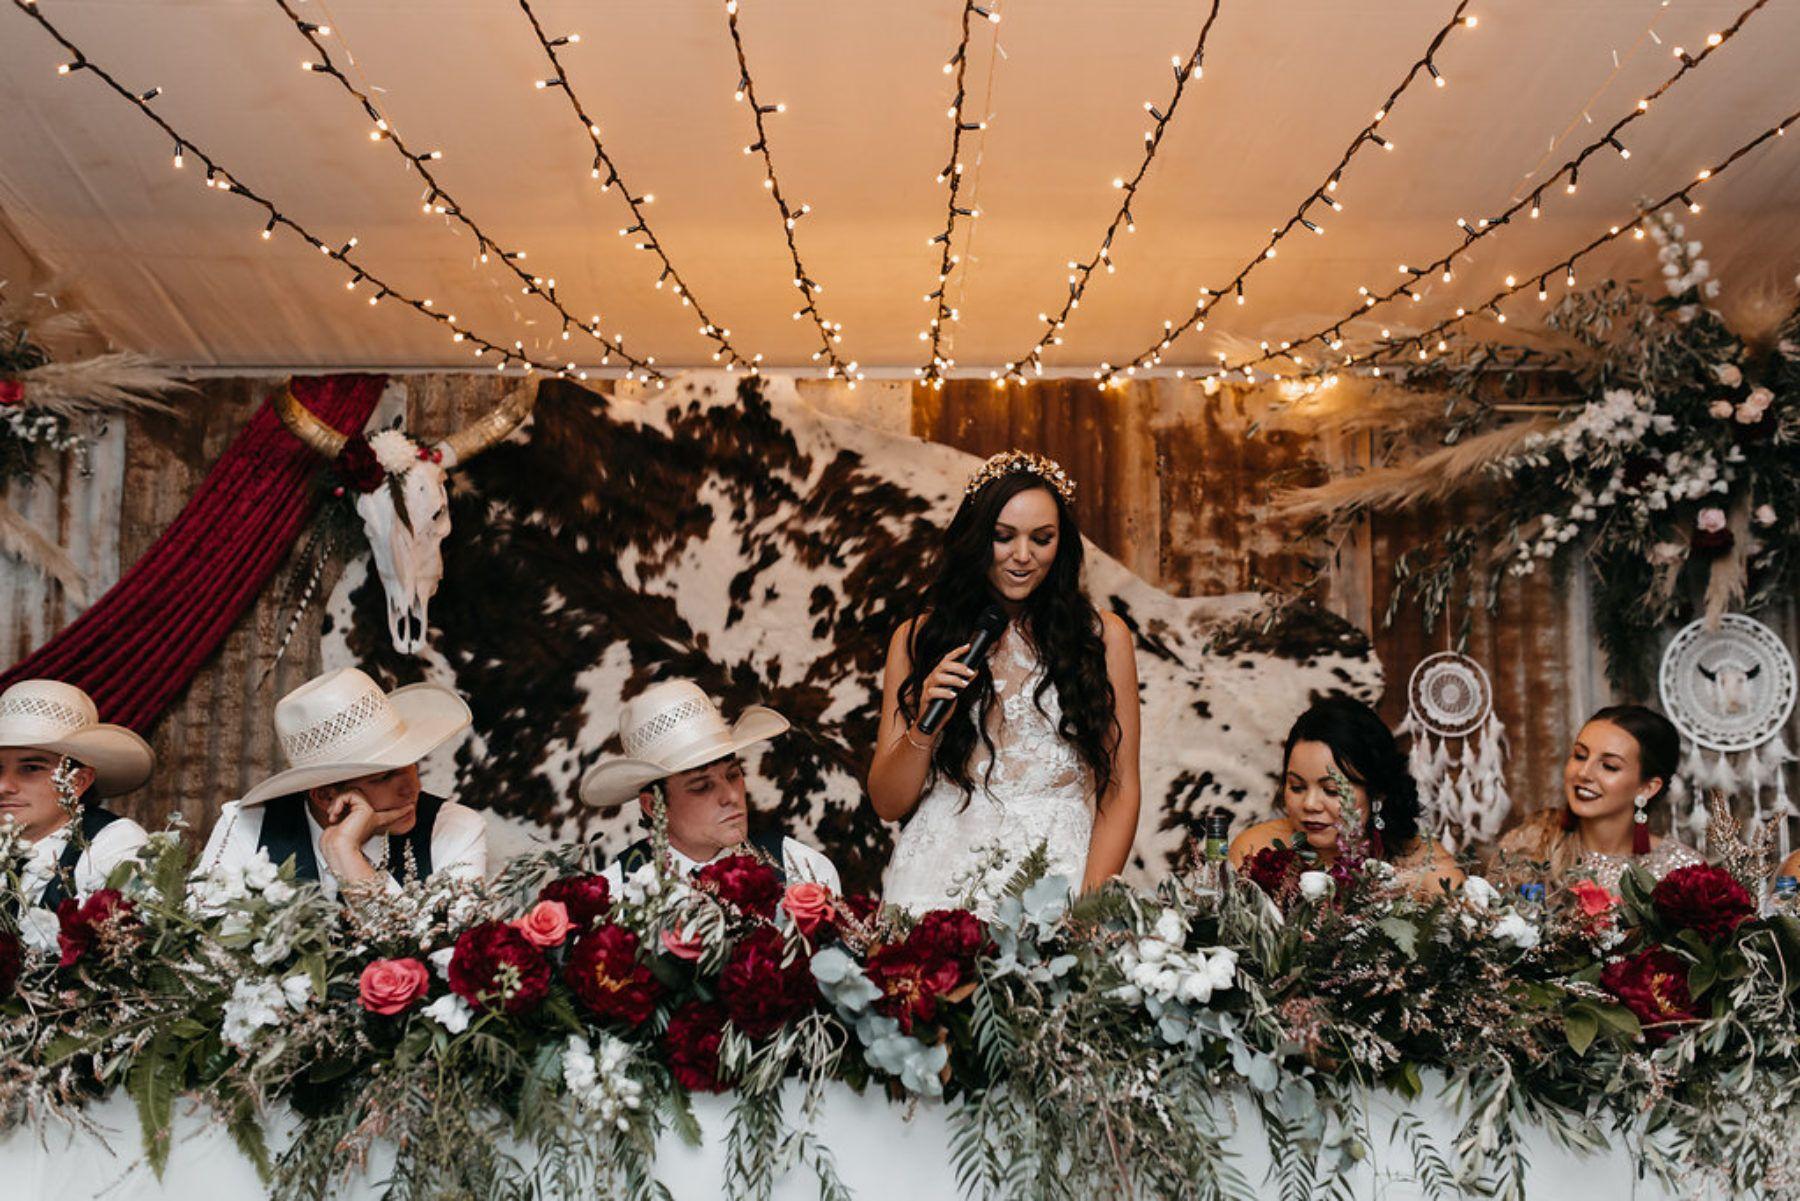 Josh Vicki S Glam Cattle Station Wedding Nouba Com Au Country Western Wedding Western Wedding Decorations Southern Wedding Ideas Country